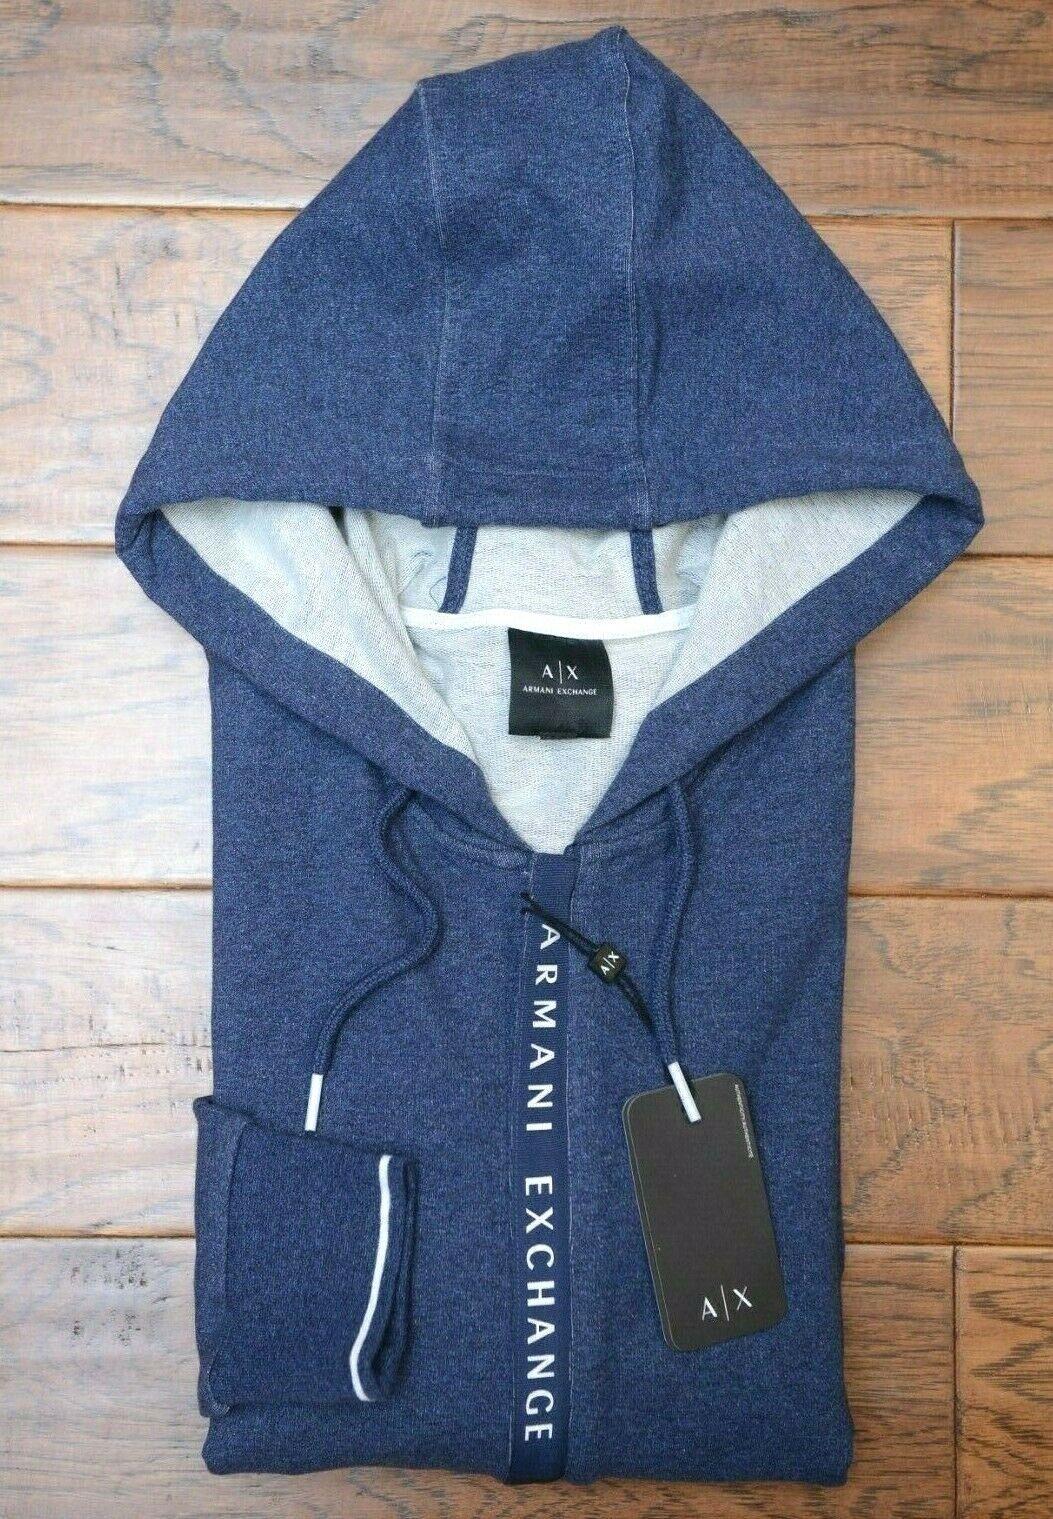 Armani Exchange A X Mens Full Zip DK Blue Stretch Cotton Hooded Jacket Hoodie XS